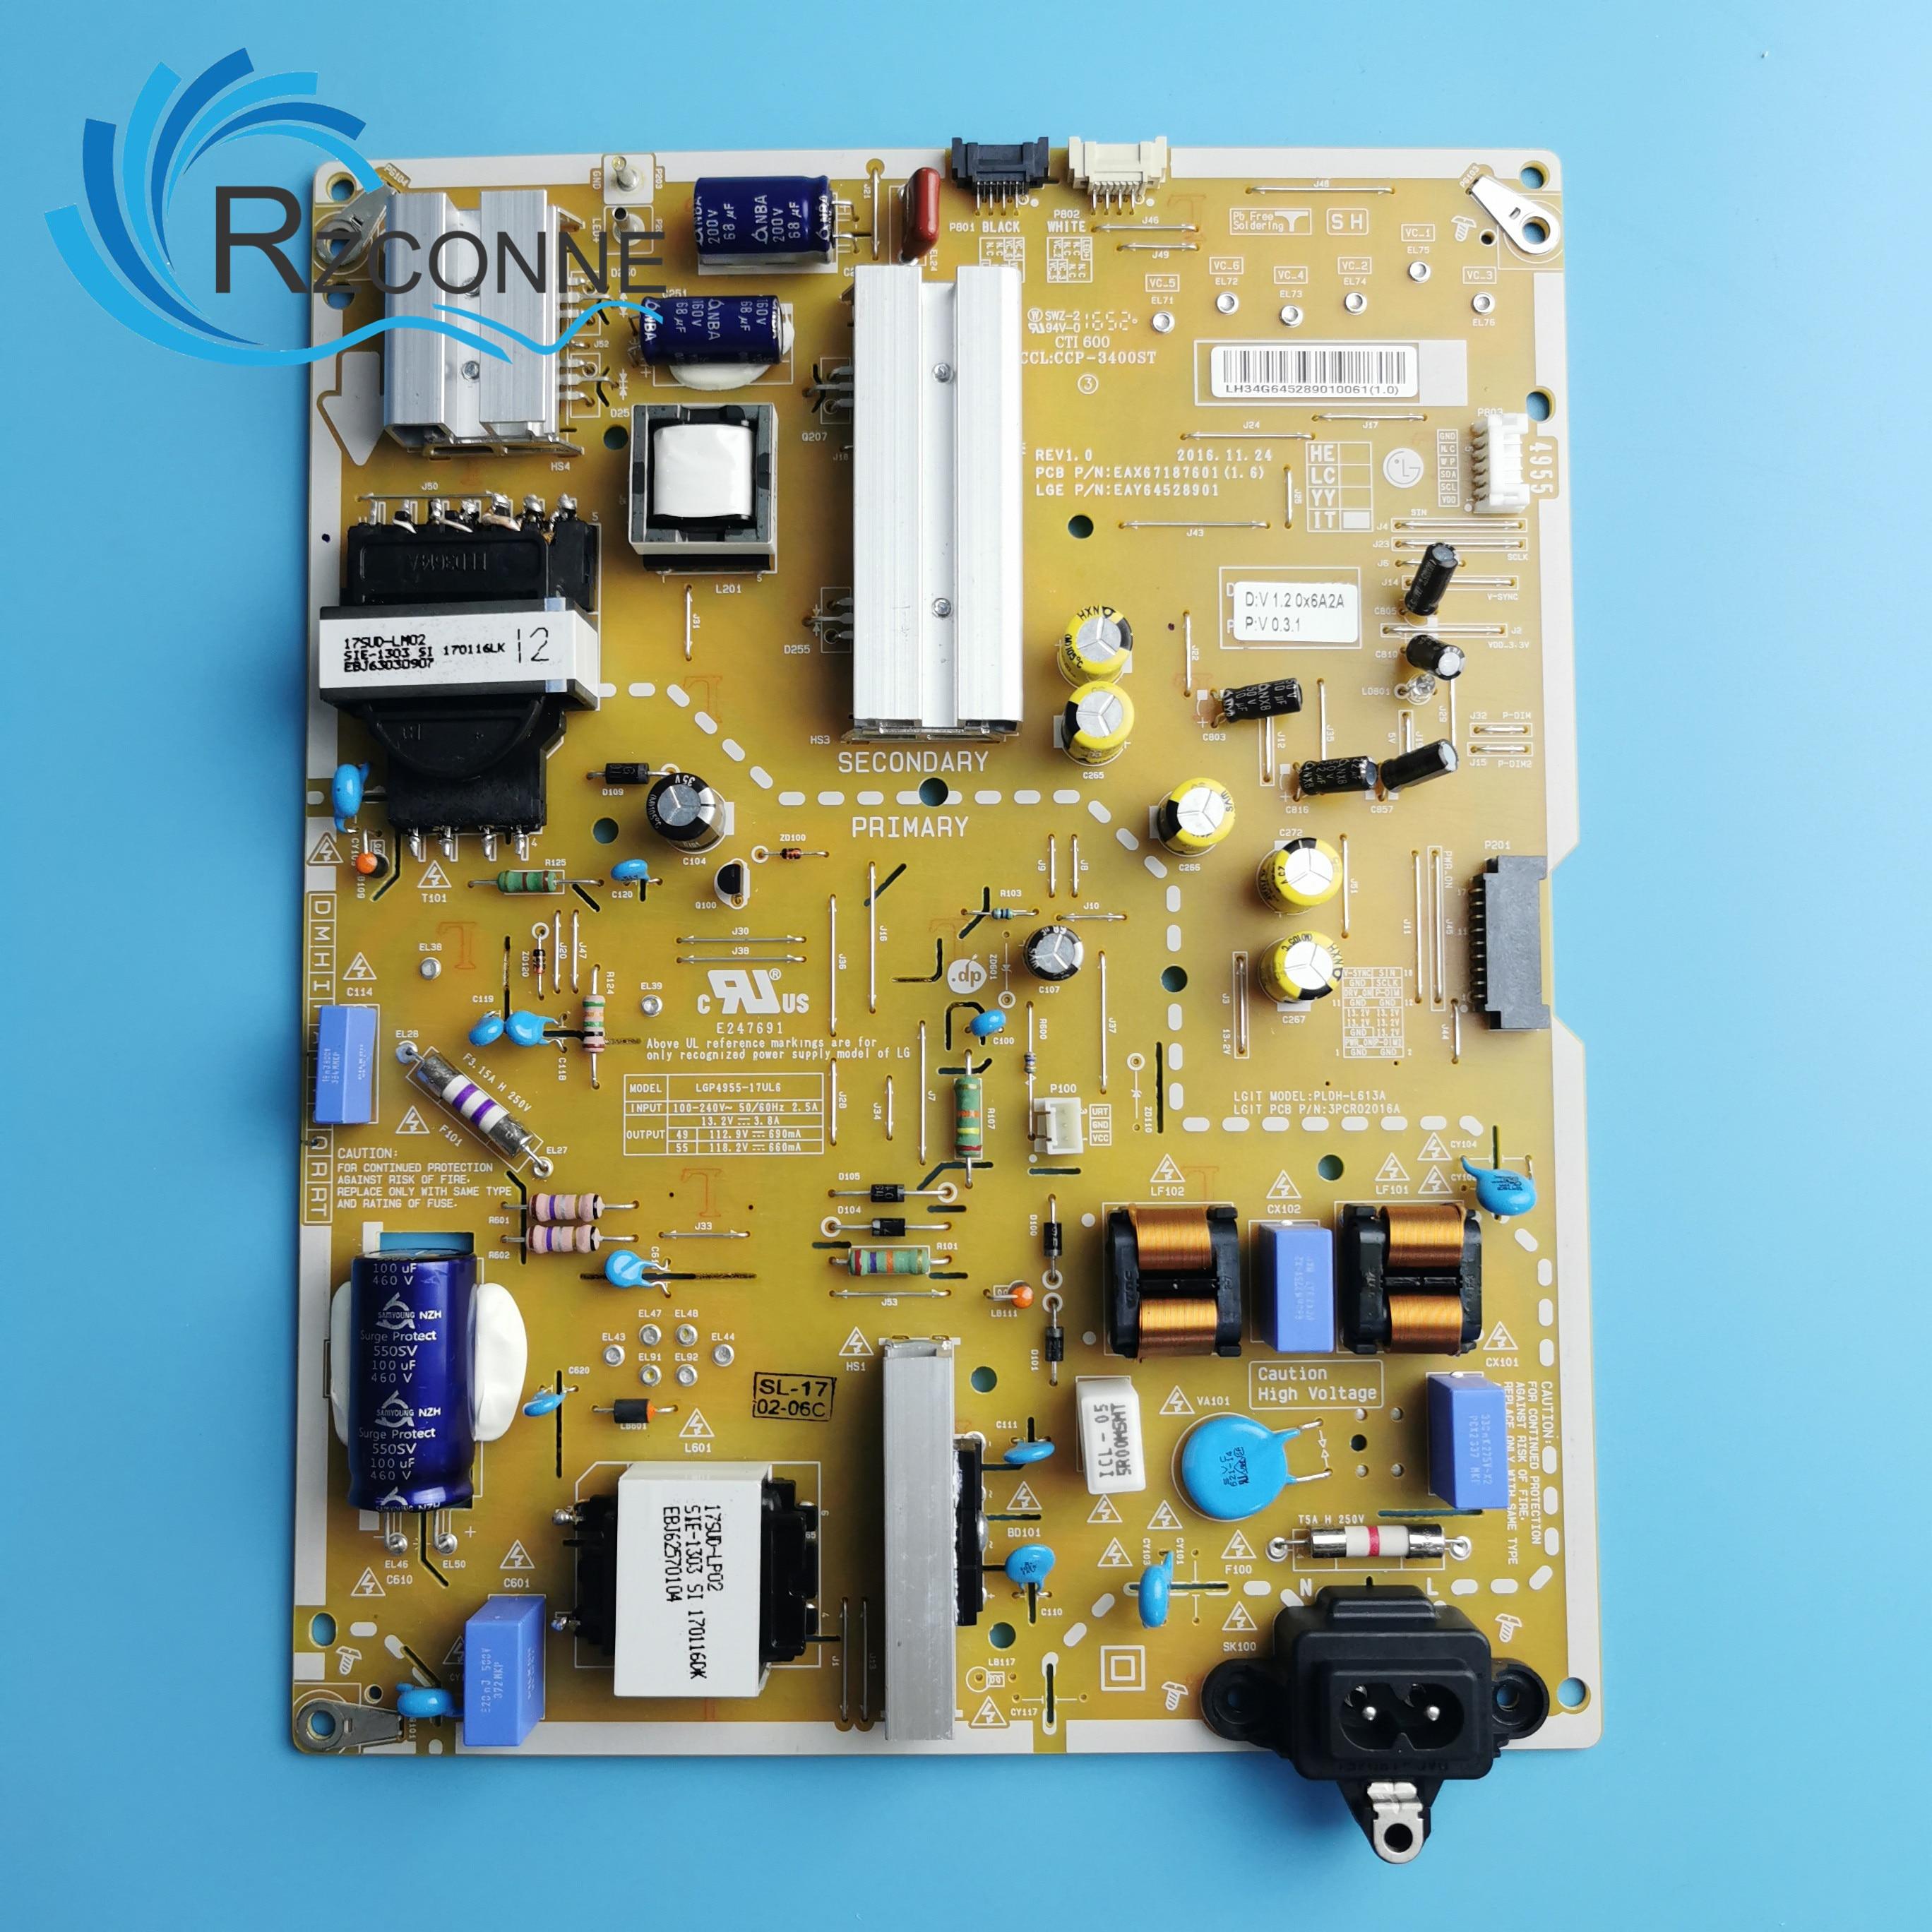 Power Board Card Supply For LG LCD TV 55UJ7700 LGP4955-17UL6 49UJ750V PLDH-L613A 49SJ810V 49SK7900PLA 55SJ800V LC490EGH-FKM1